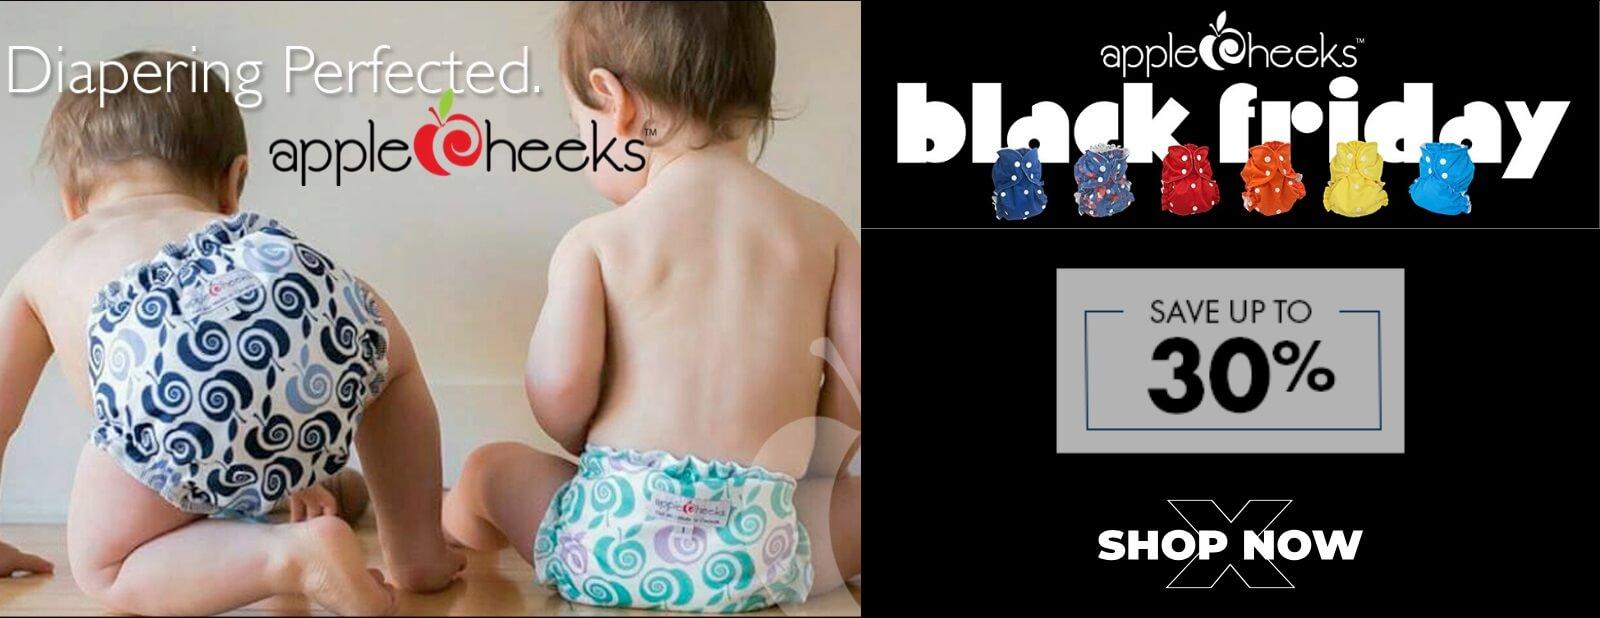 applecheeks cloth diapers black friday sale